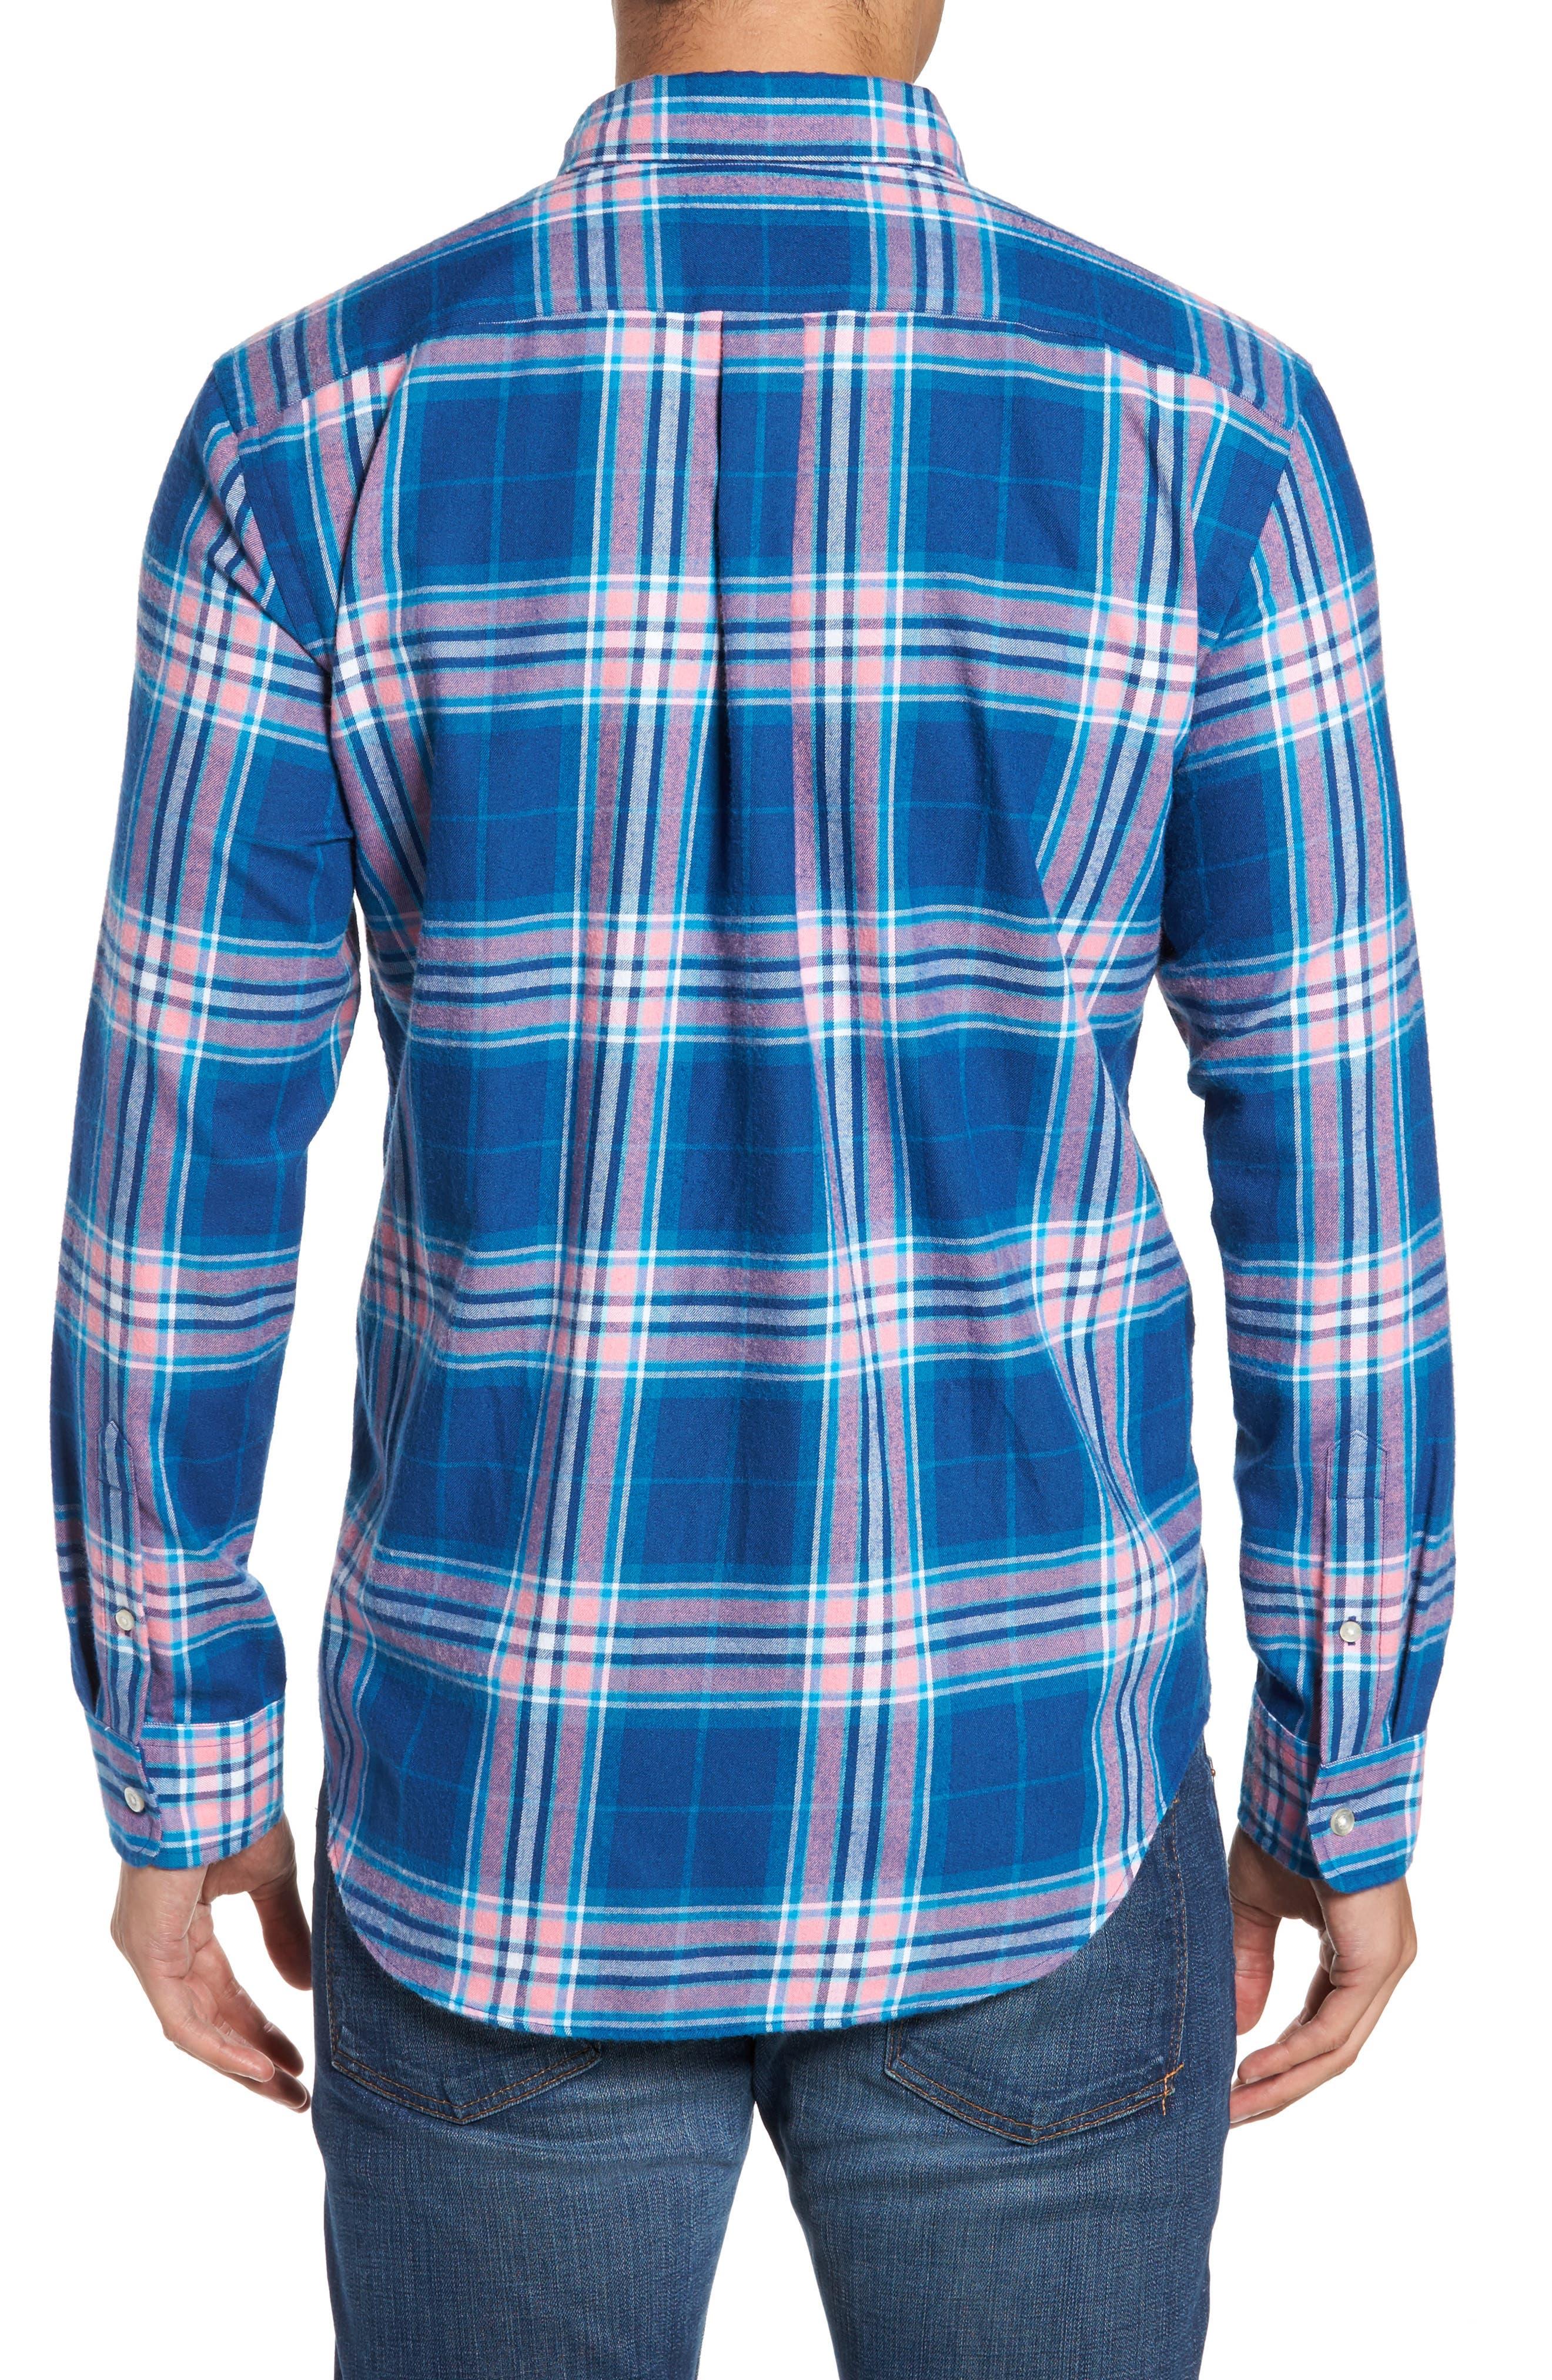 Alternate Image 2  - vineyard vines Murray Classic Fit Point Lobos Plaid Flannel Sport Shirt